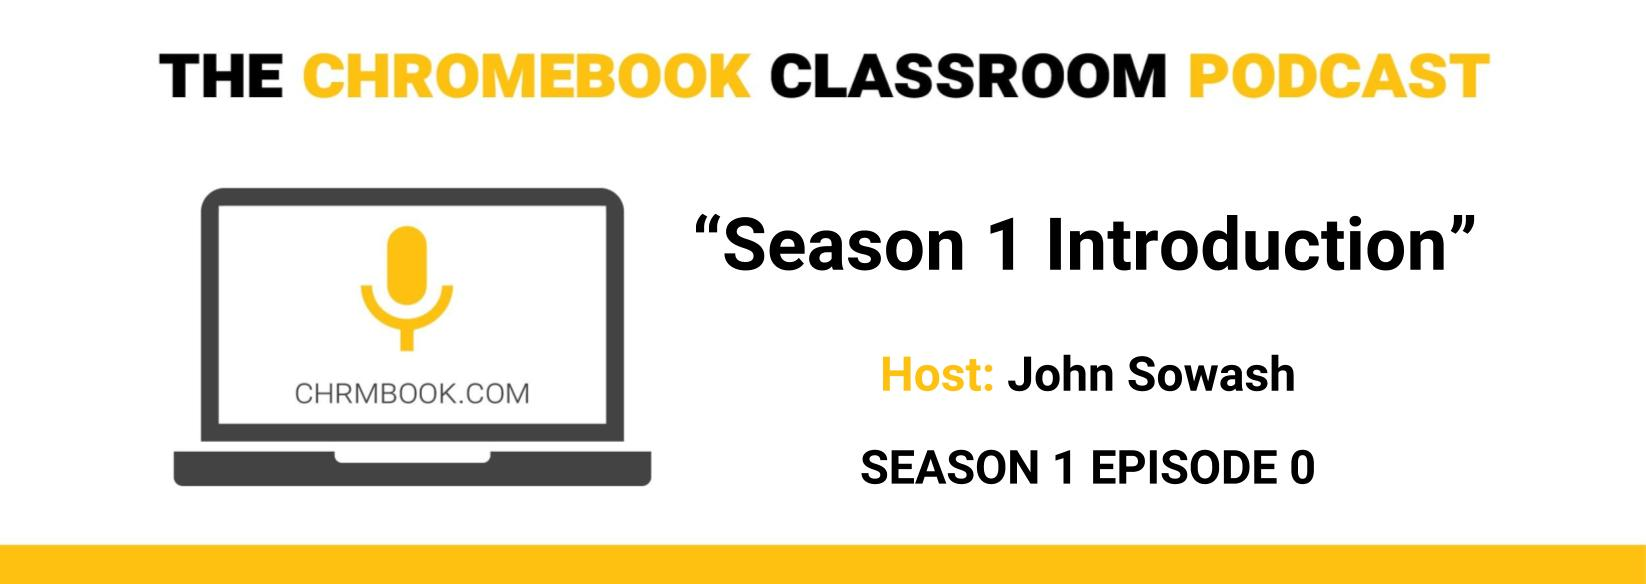 The Chromebook Classroom Podcast- Season 1 Introduction